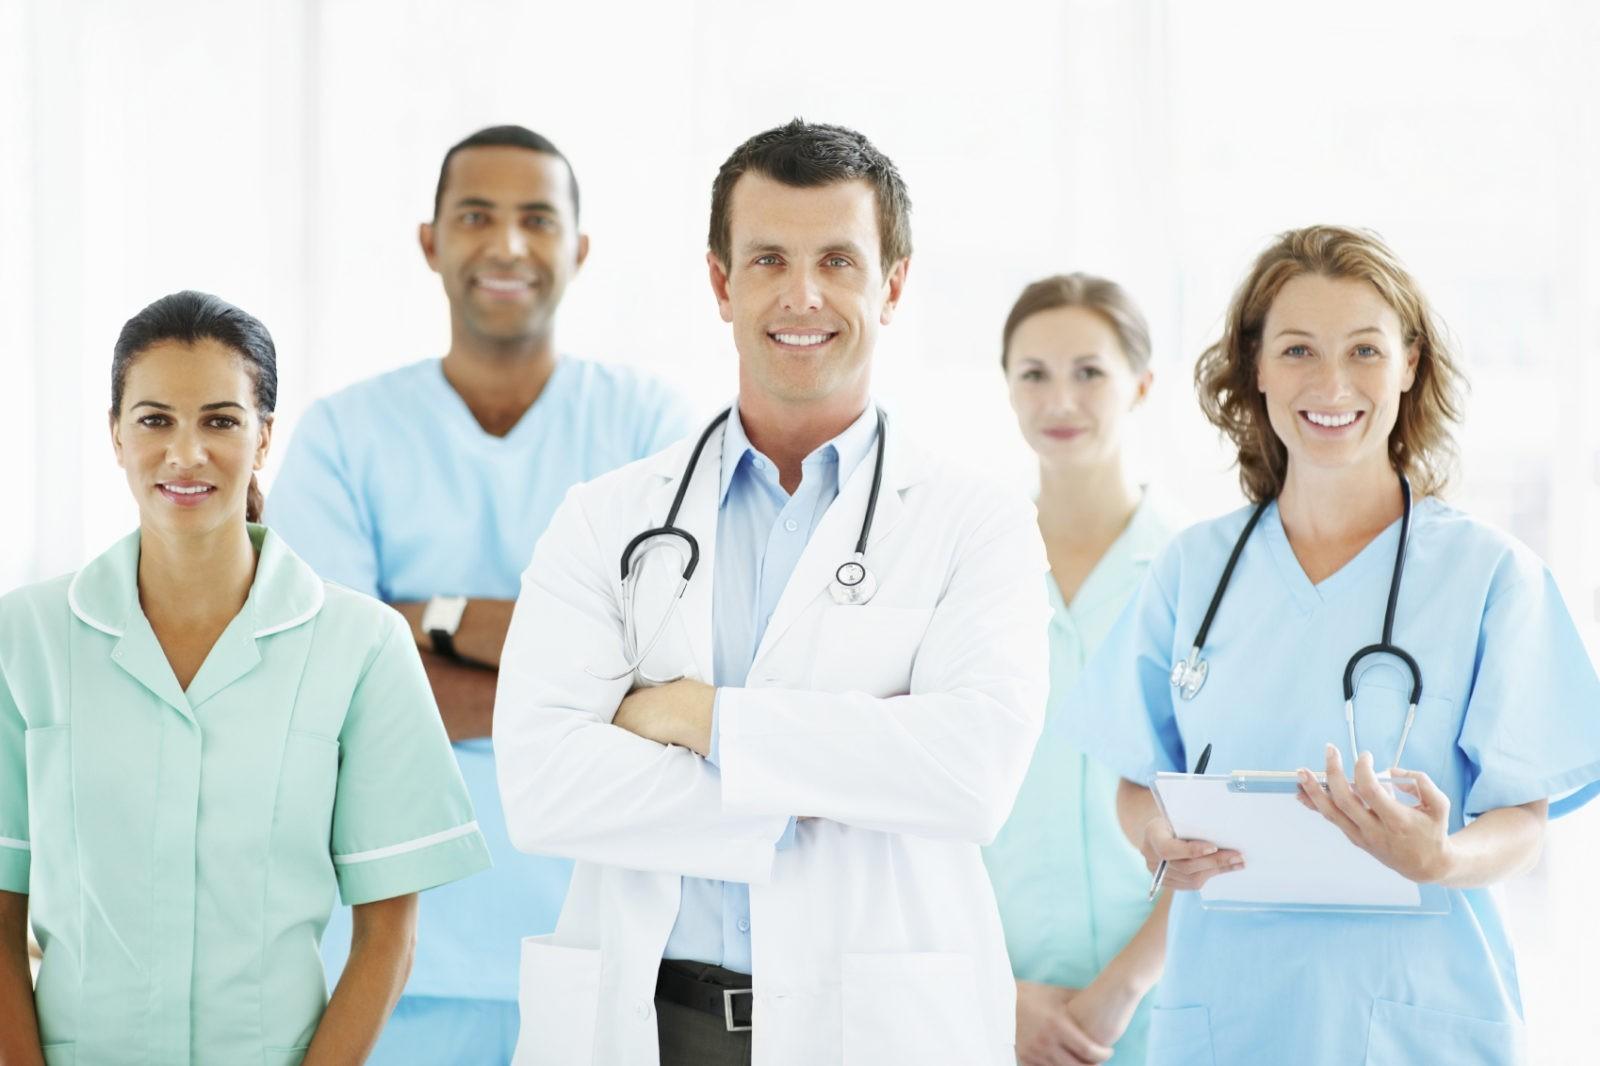 clinica dental toledo equipo